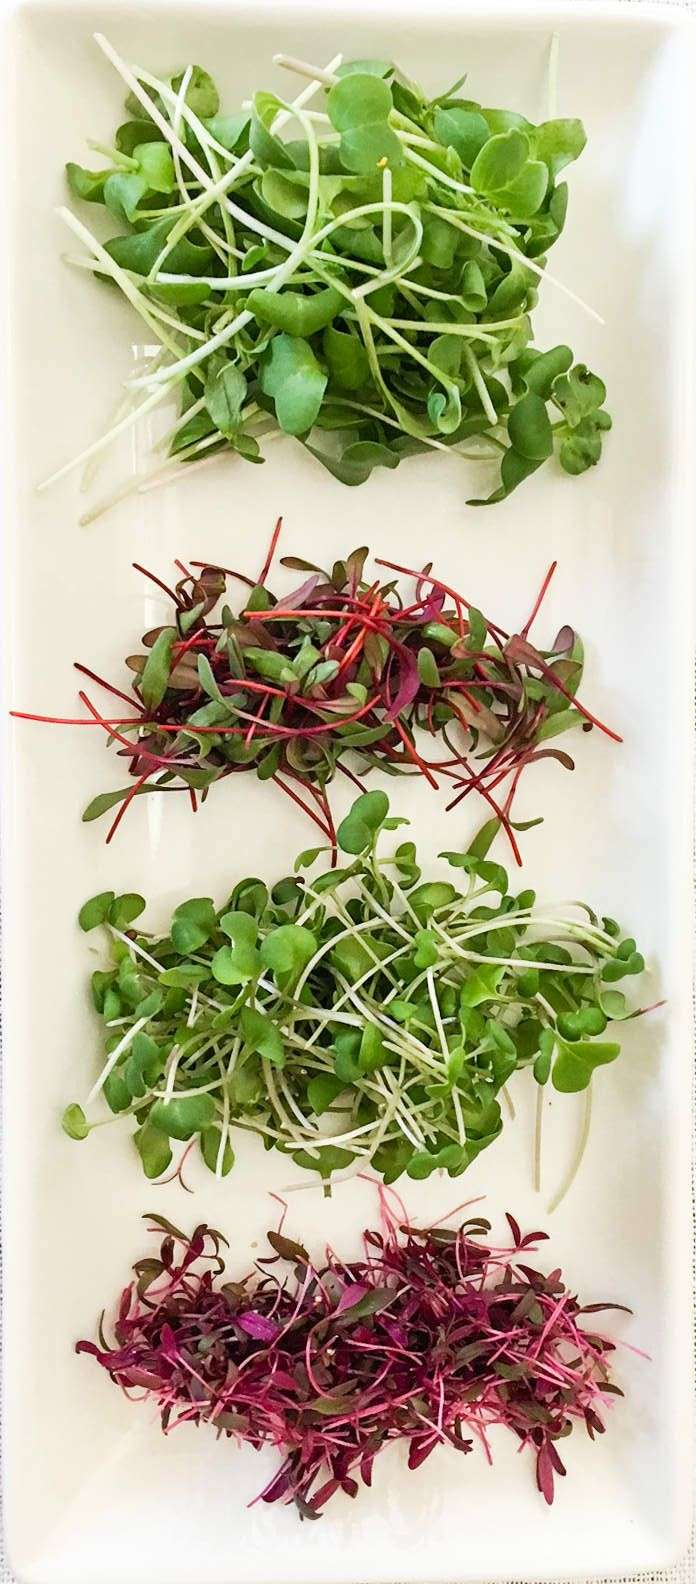 Conheça os microverdes e confira 7 razões para cultivá-los